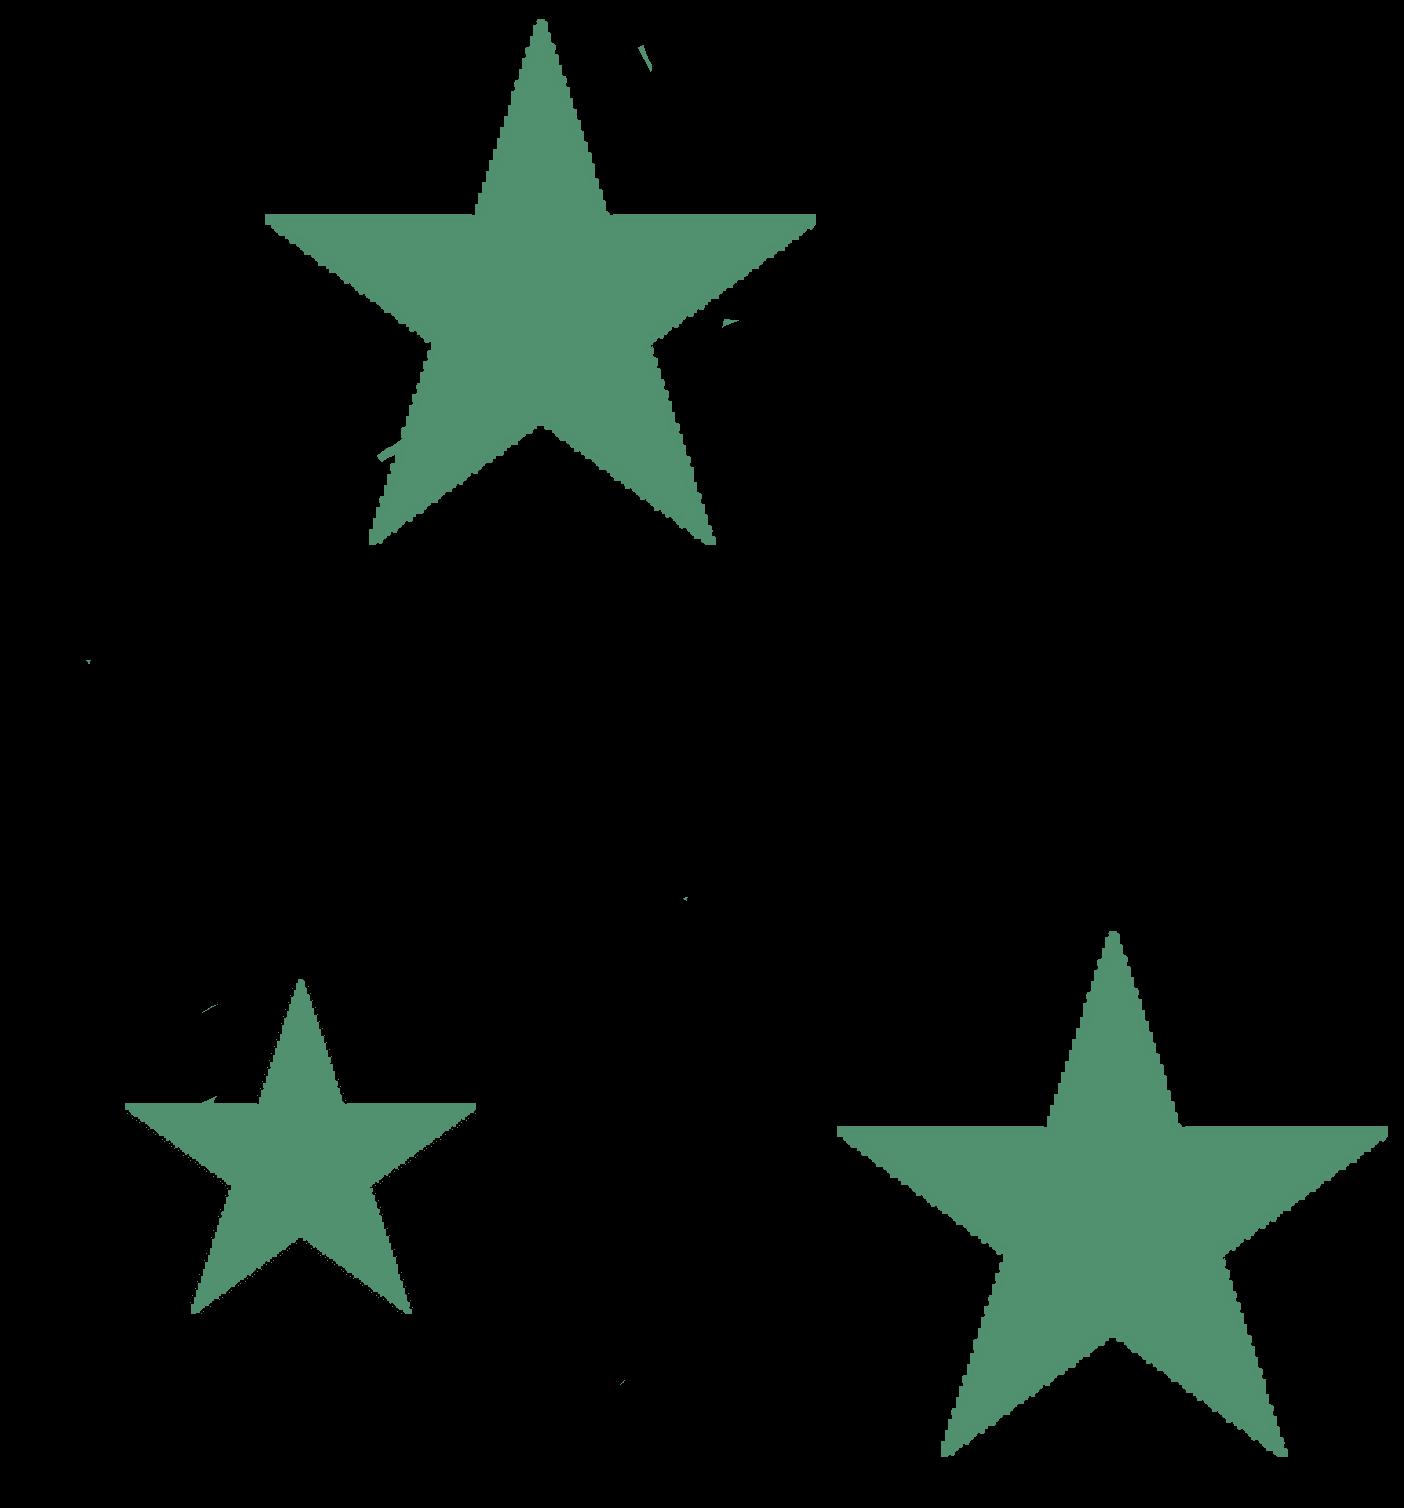 File:Logo stars (green).png - Wikimedia Commons